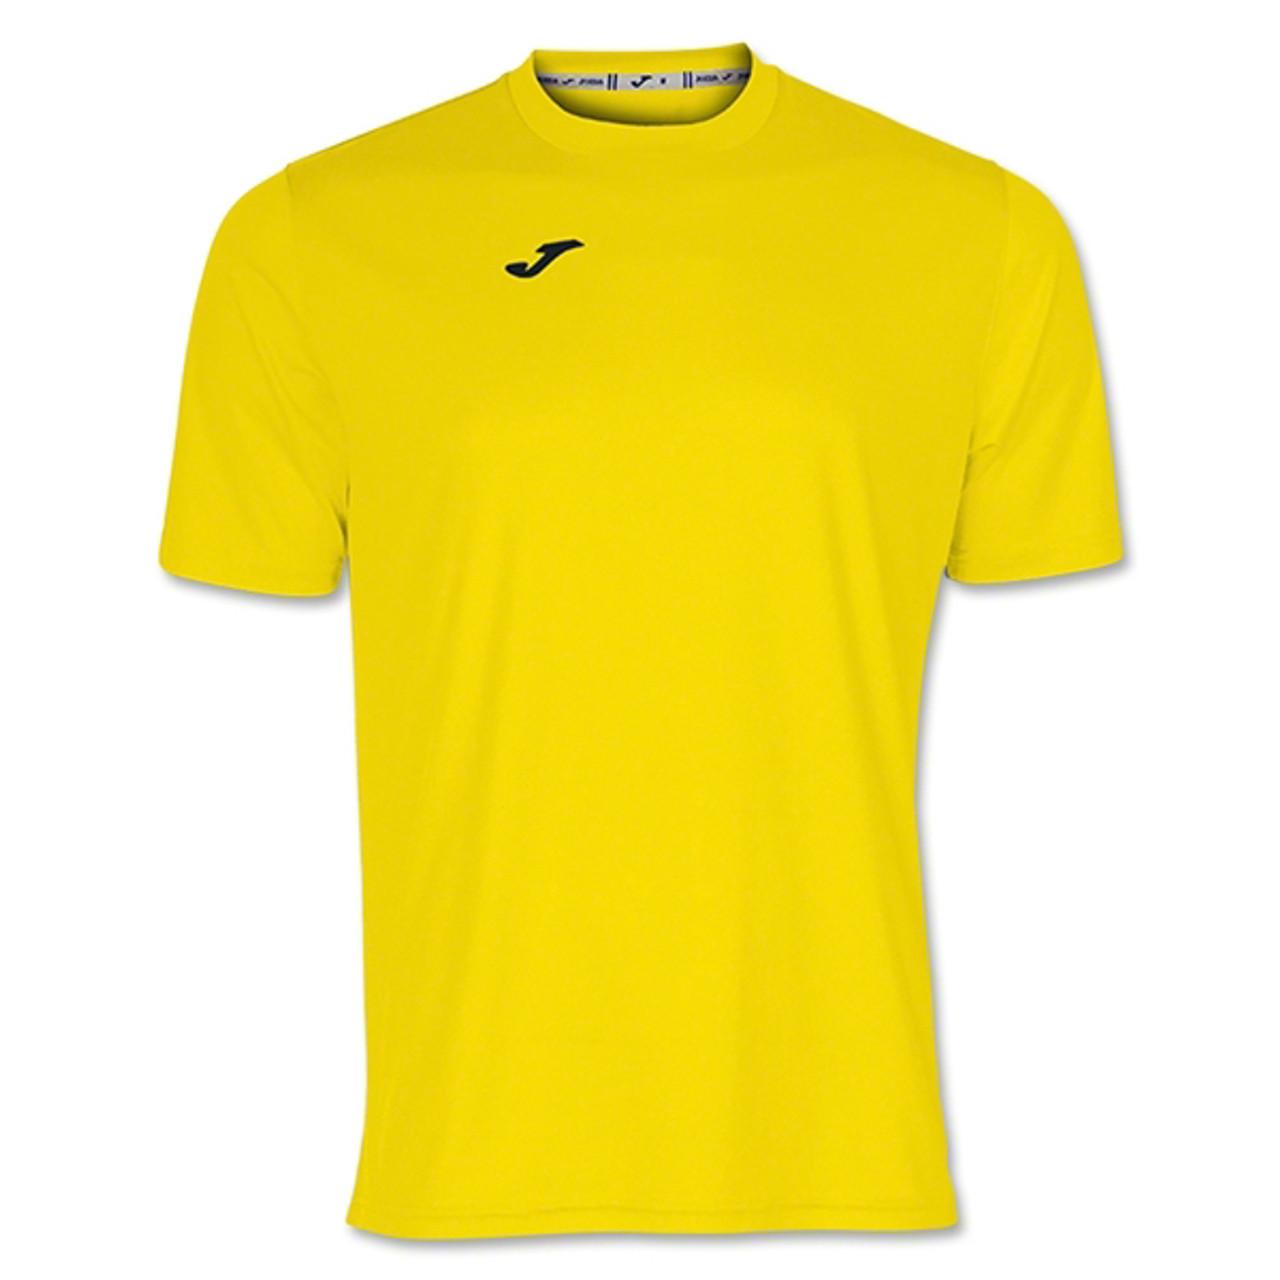 4f4580b25d JOMA COMBI JERSEY YELLOW soccer team uniform - Soccer Plus